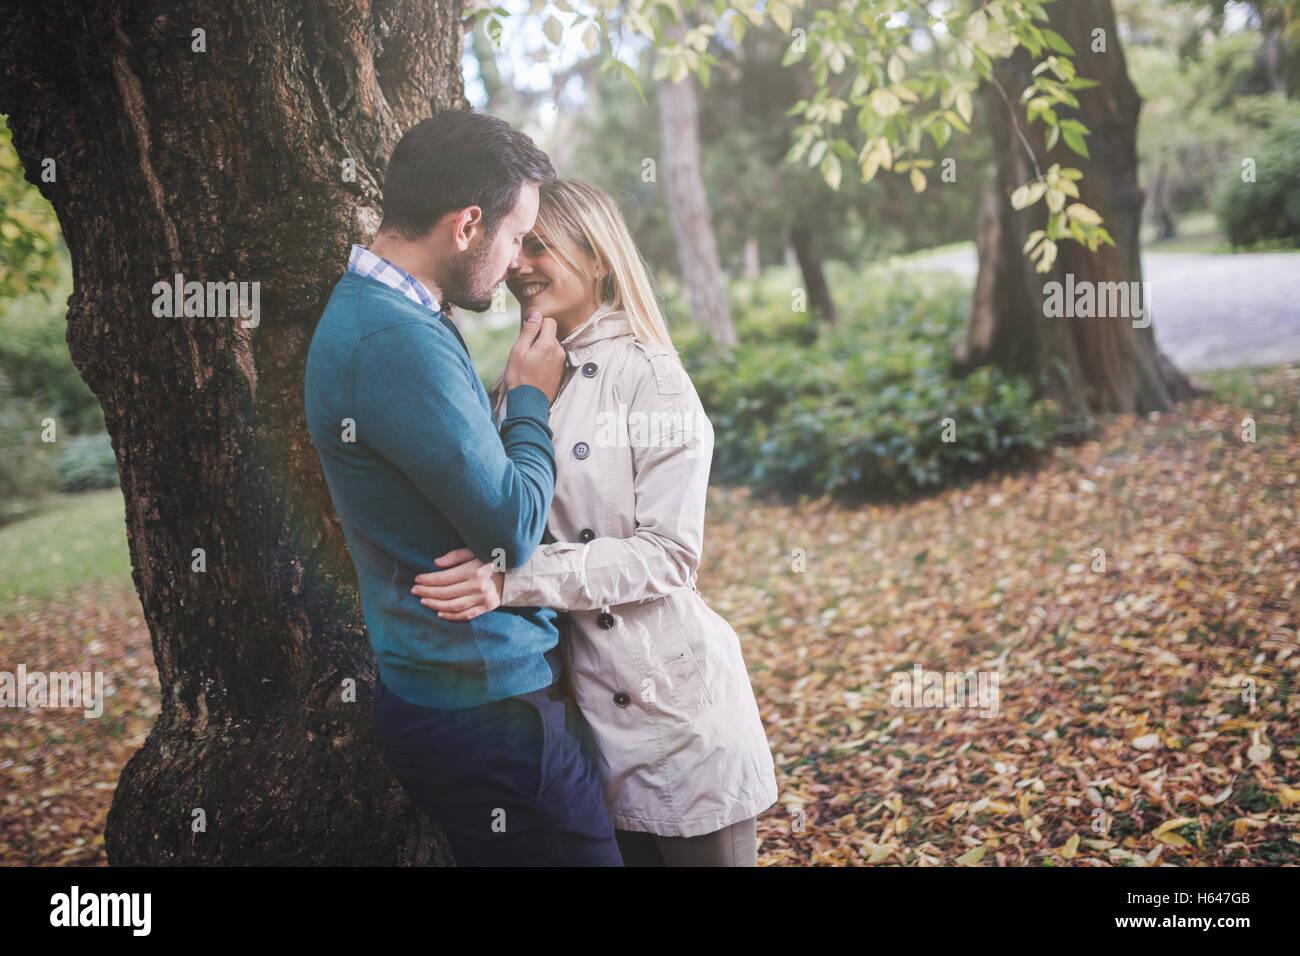 Loving happy couple walking in park - Stock Image